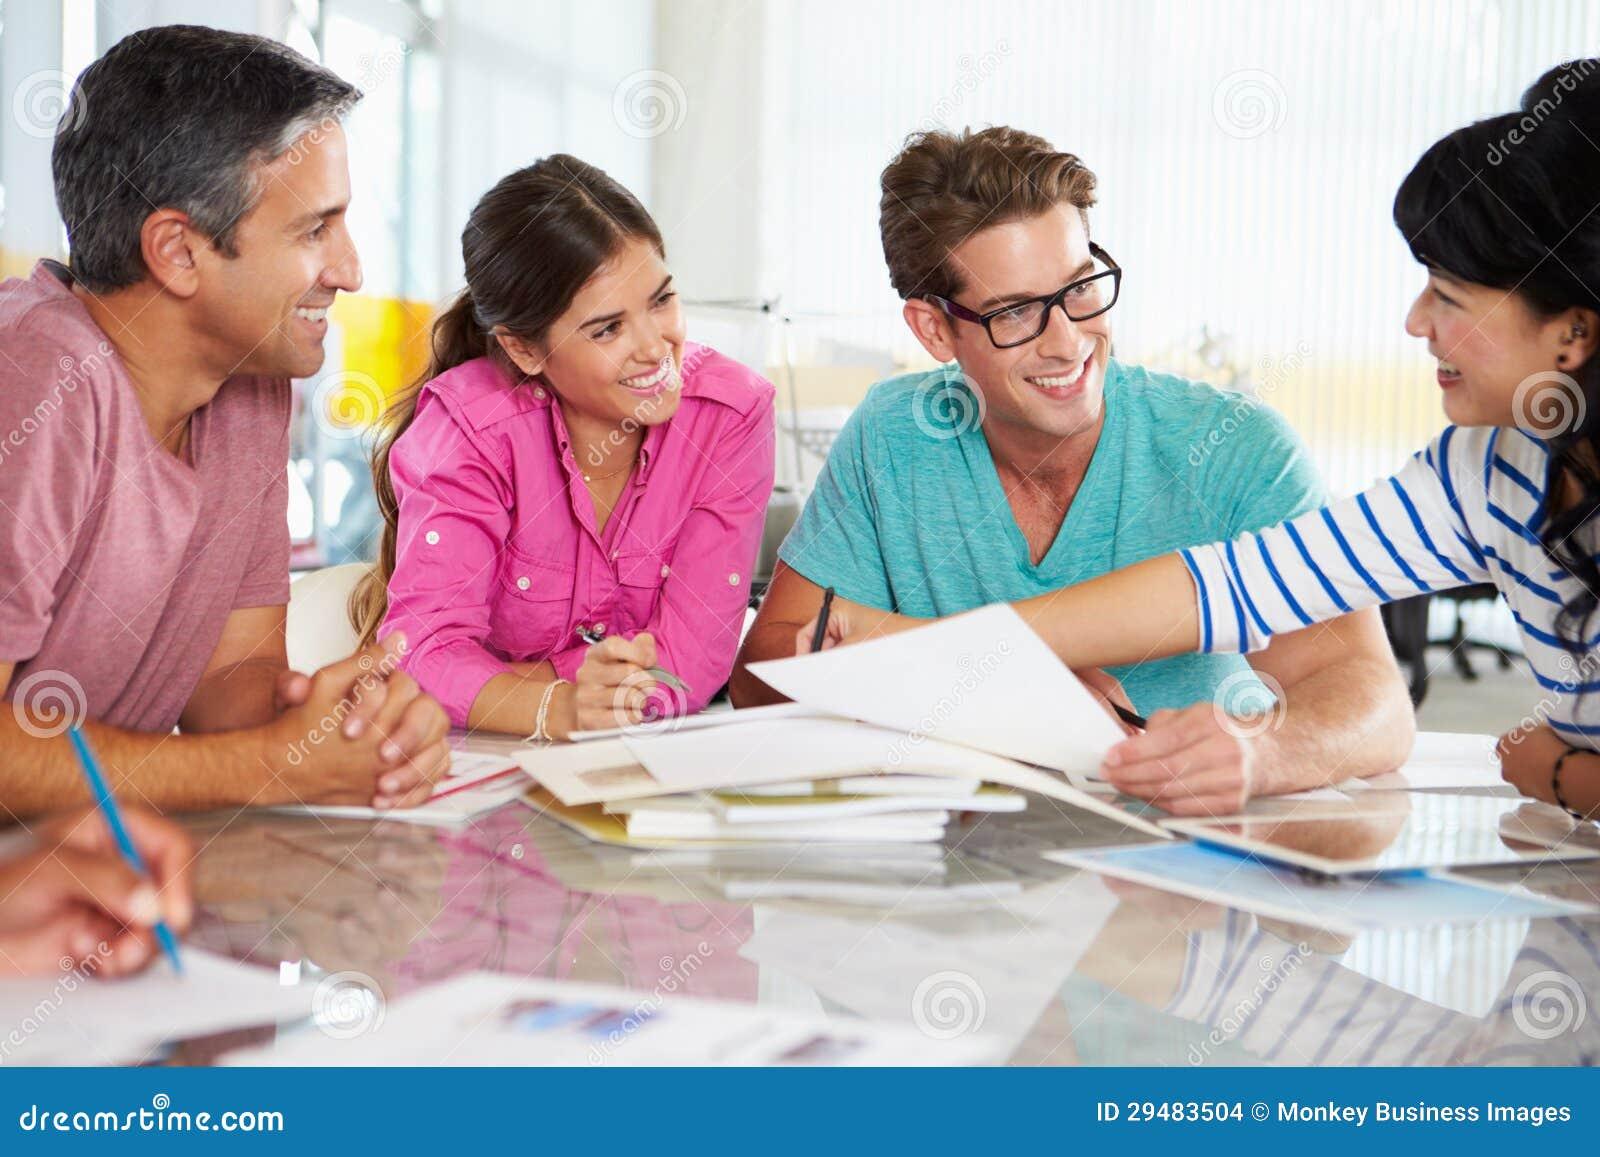 Team-Sitzung im kreativen Büro